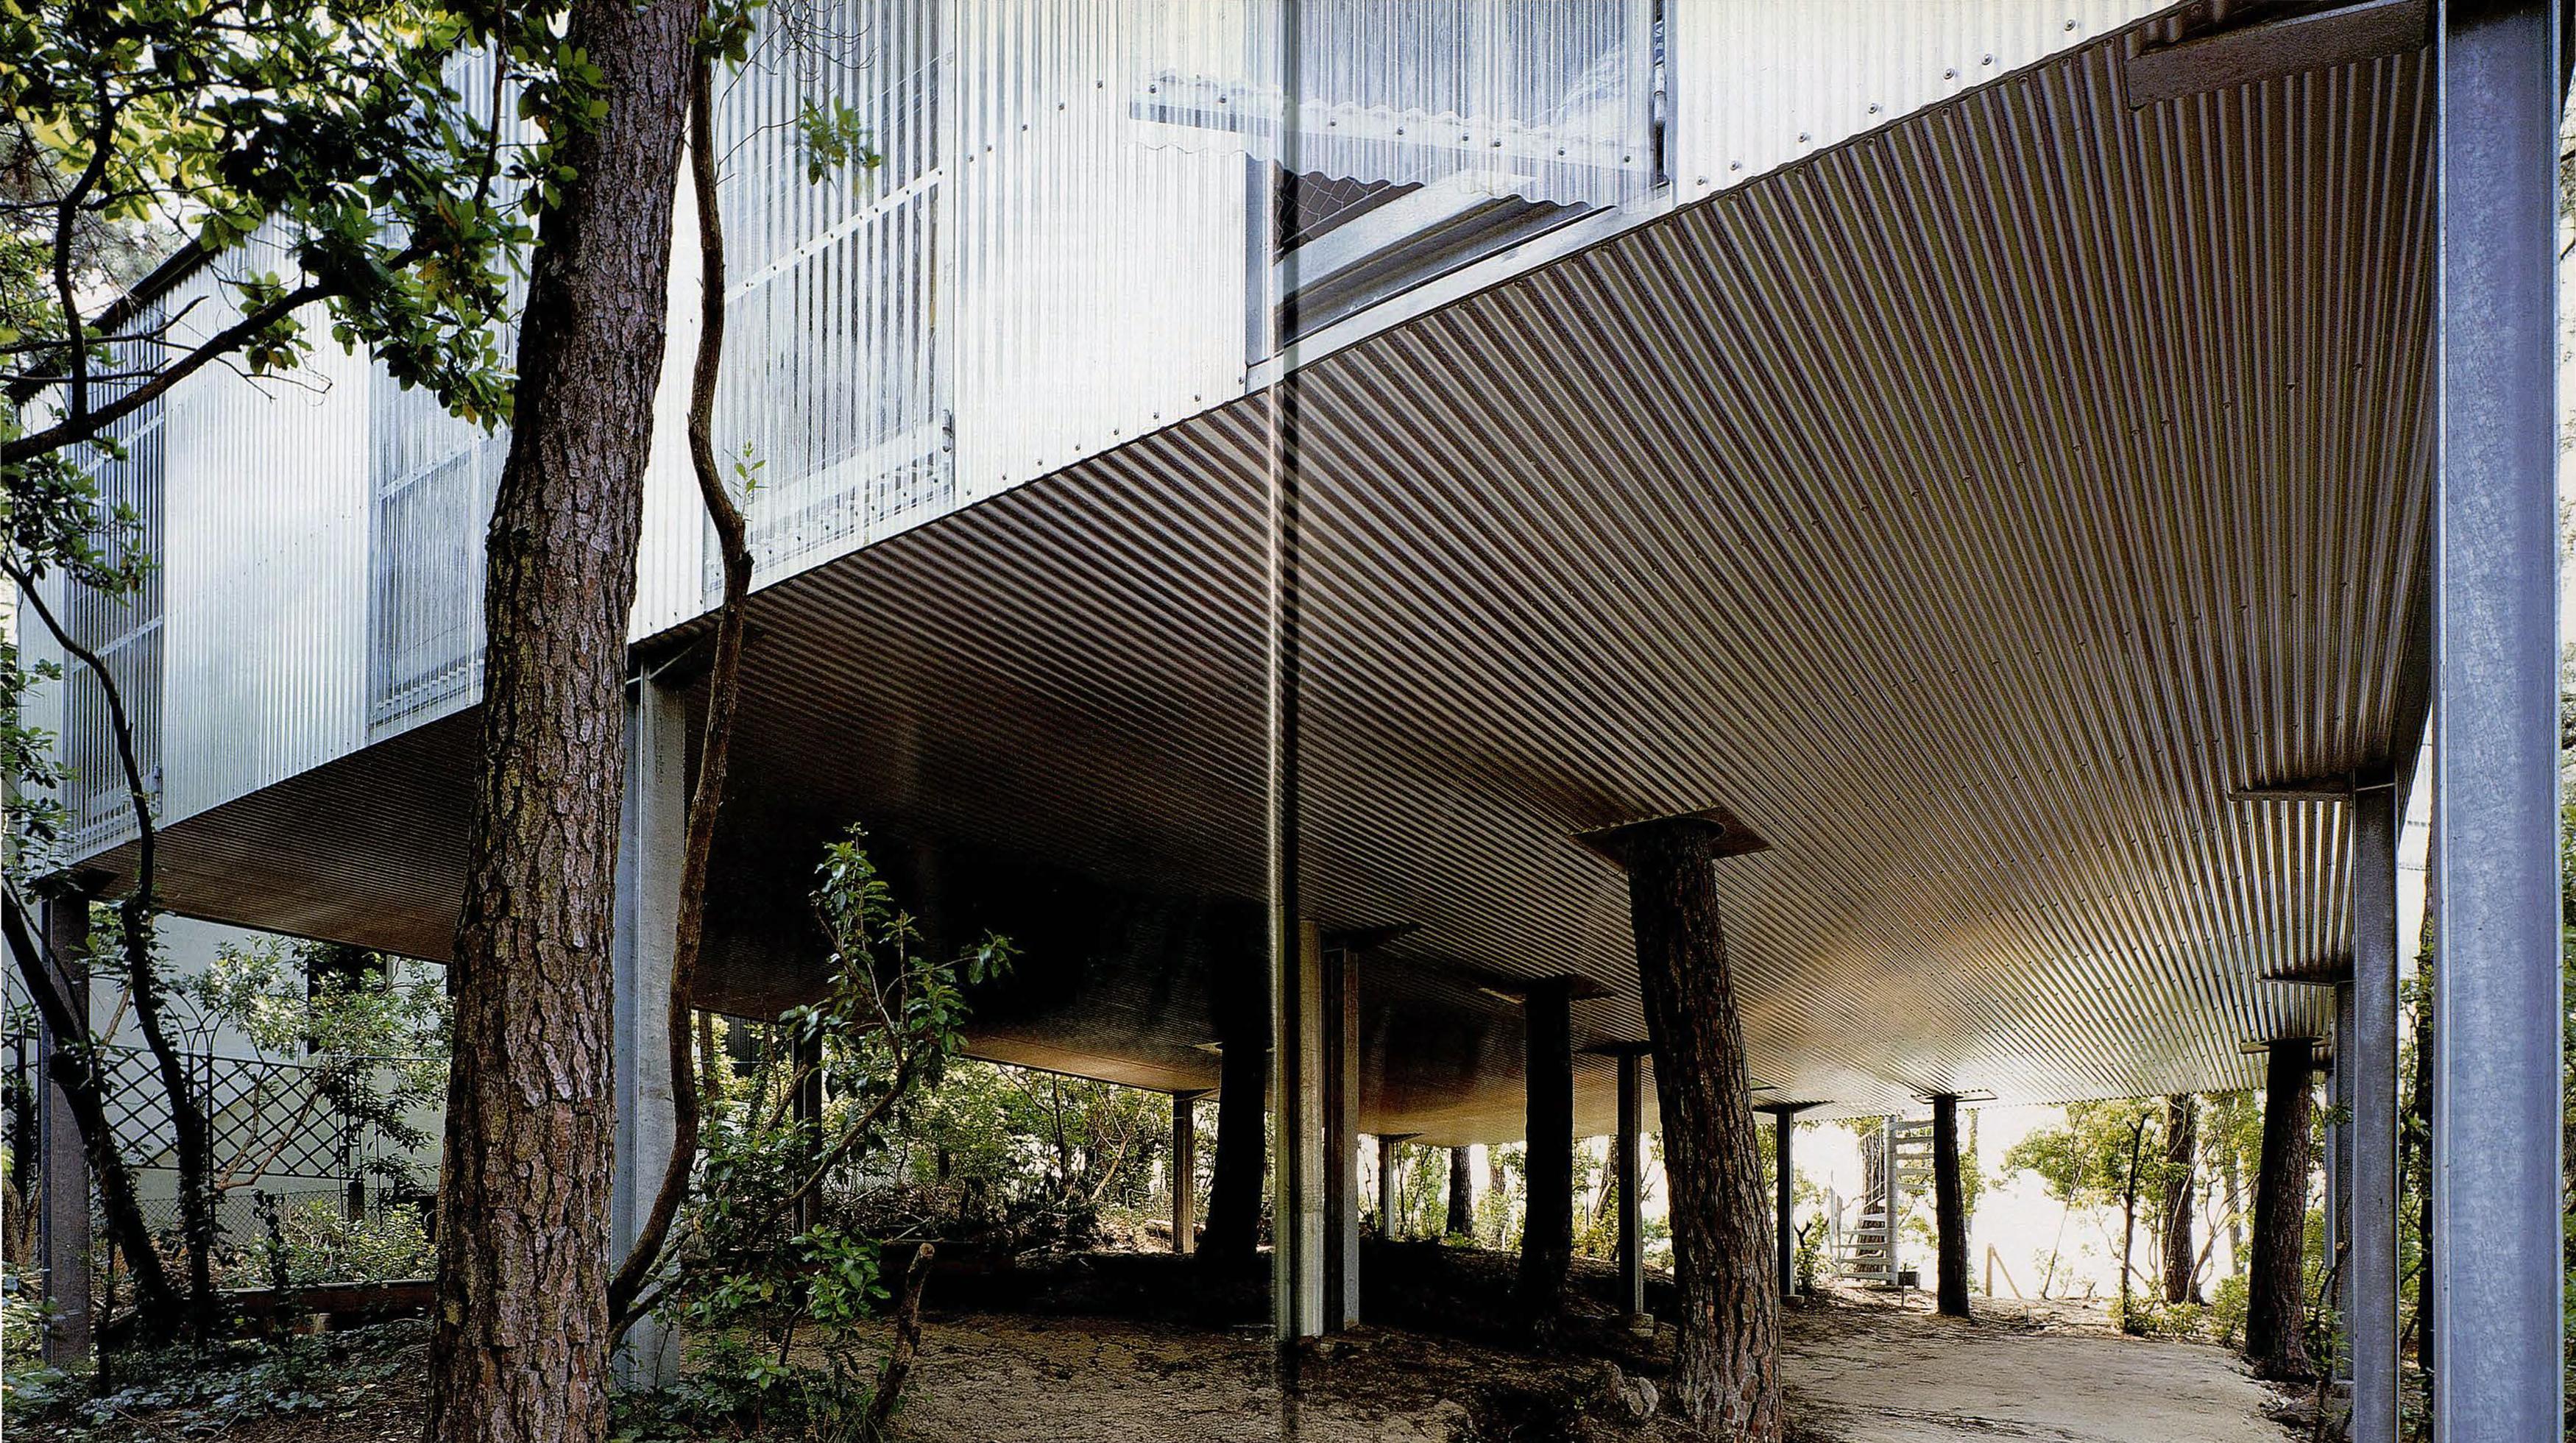 ATLAS-OF-PLACES-LACATON-VASSAL-CAP-FERRET-HOUSE-IMG-16